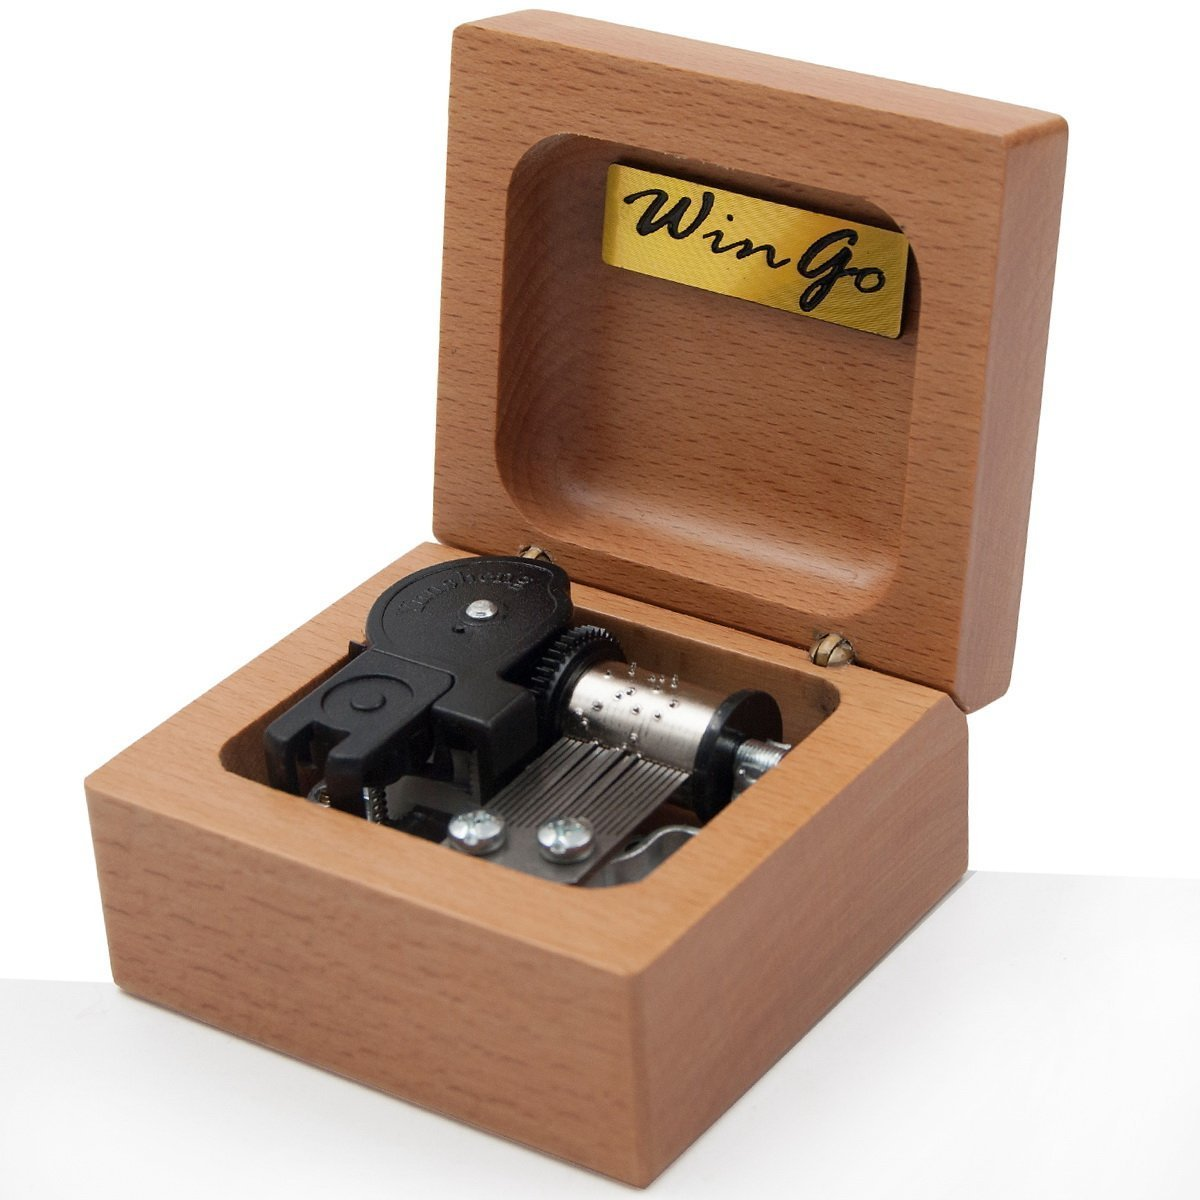 Mini 18 Note Wind-up Beech Wooden Music Box Tune of Fur Elise Wingostore